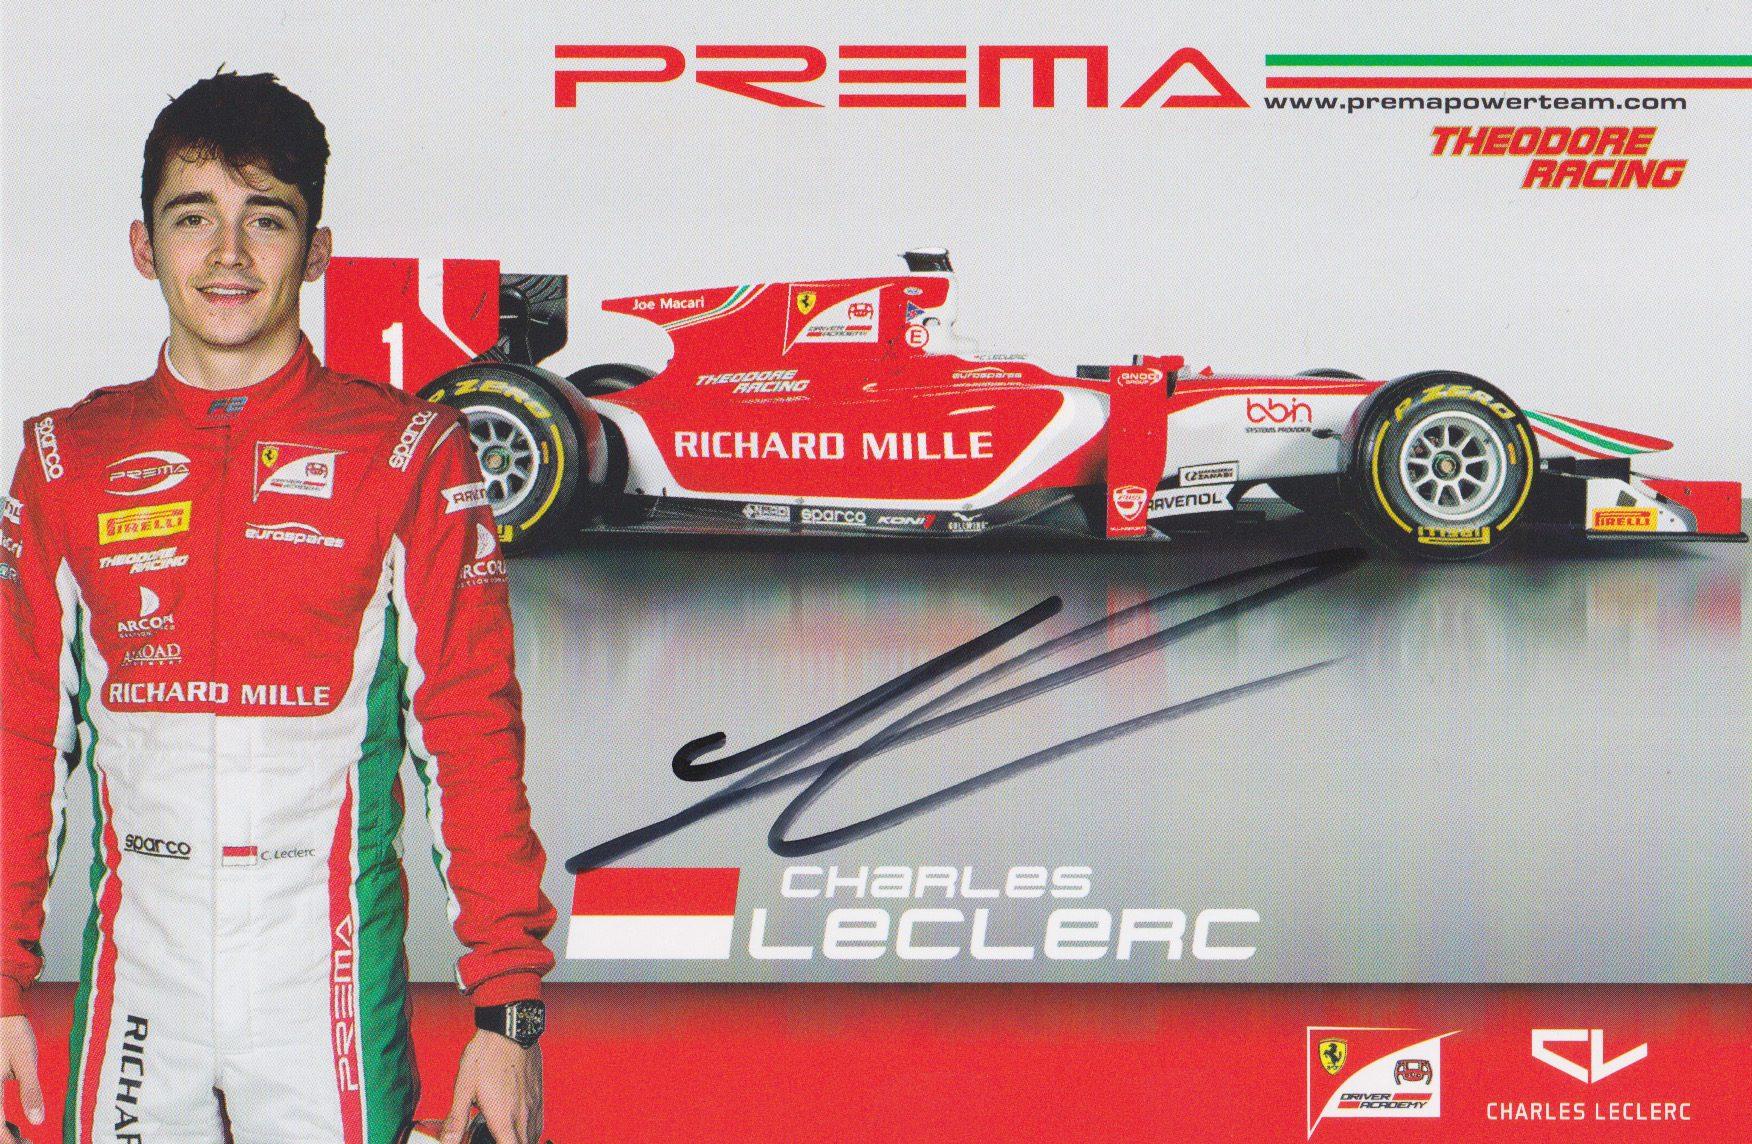 Charles Leclerc Prema 2017 Card